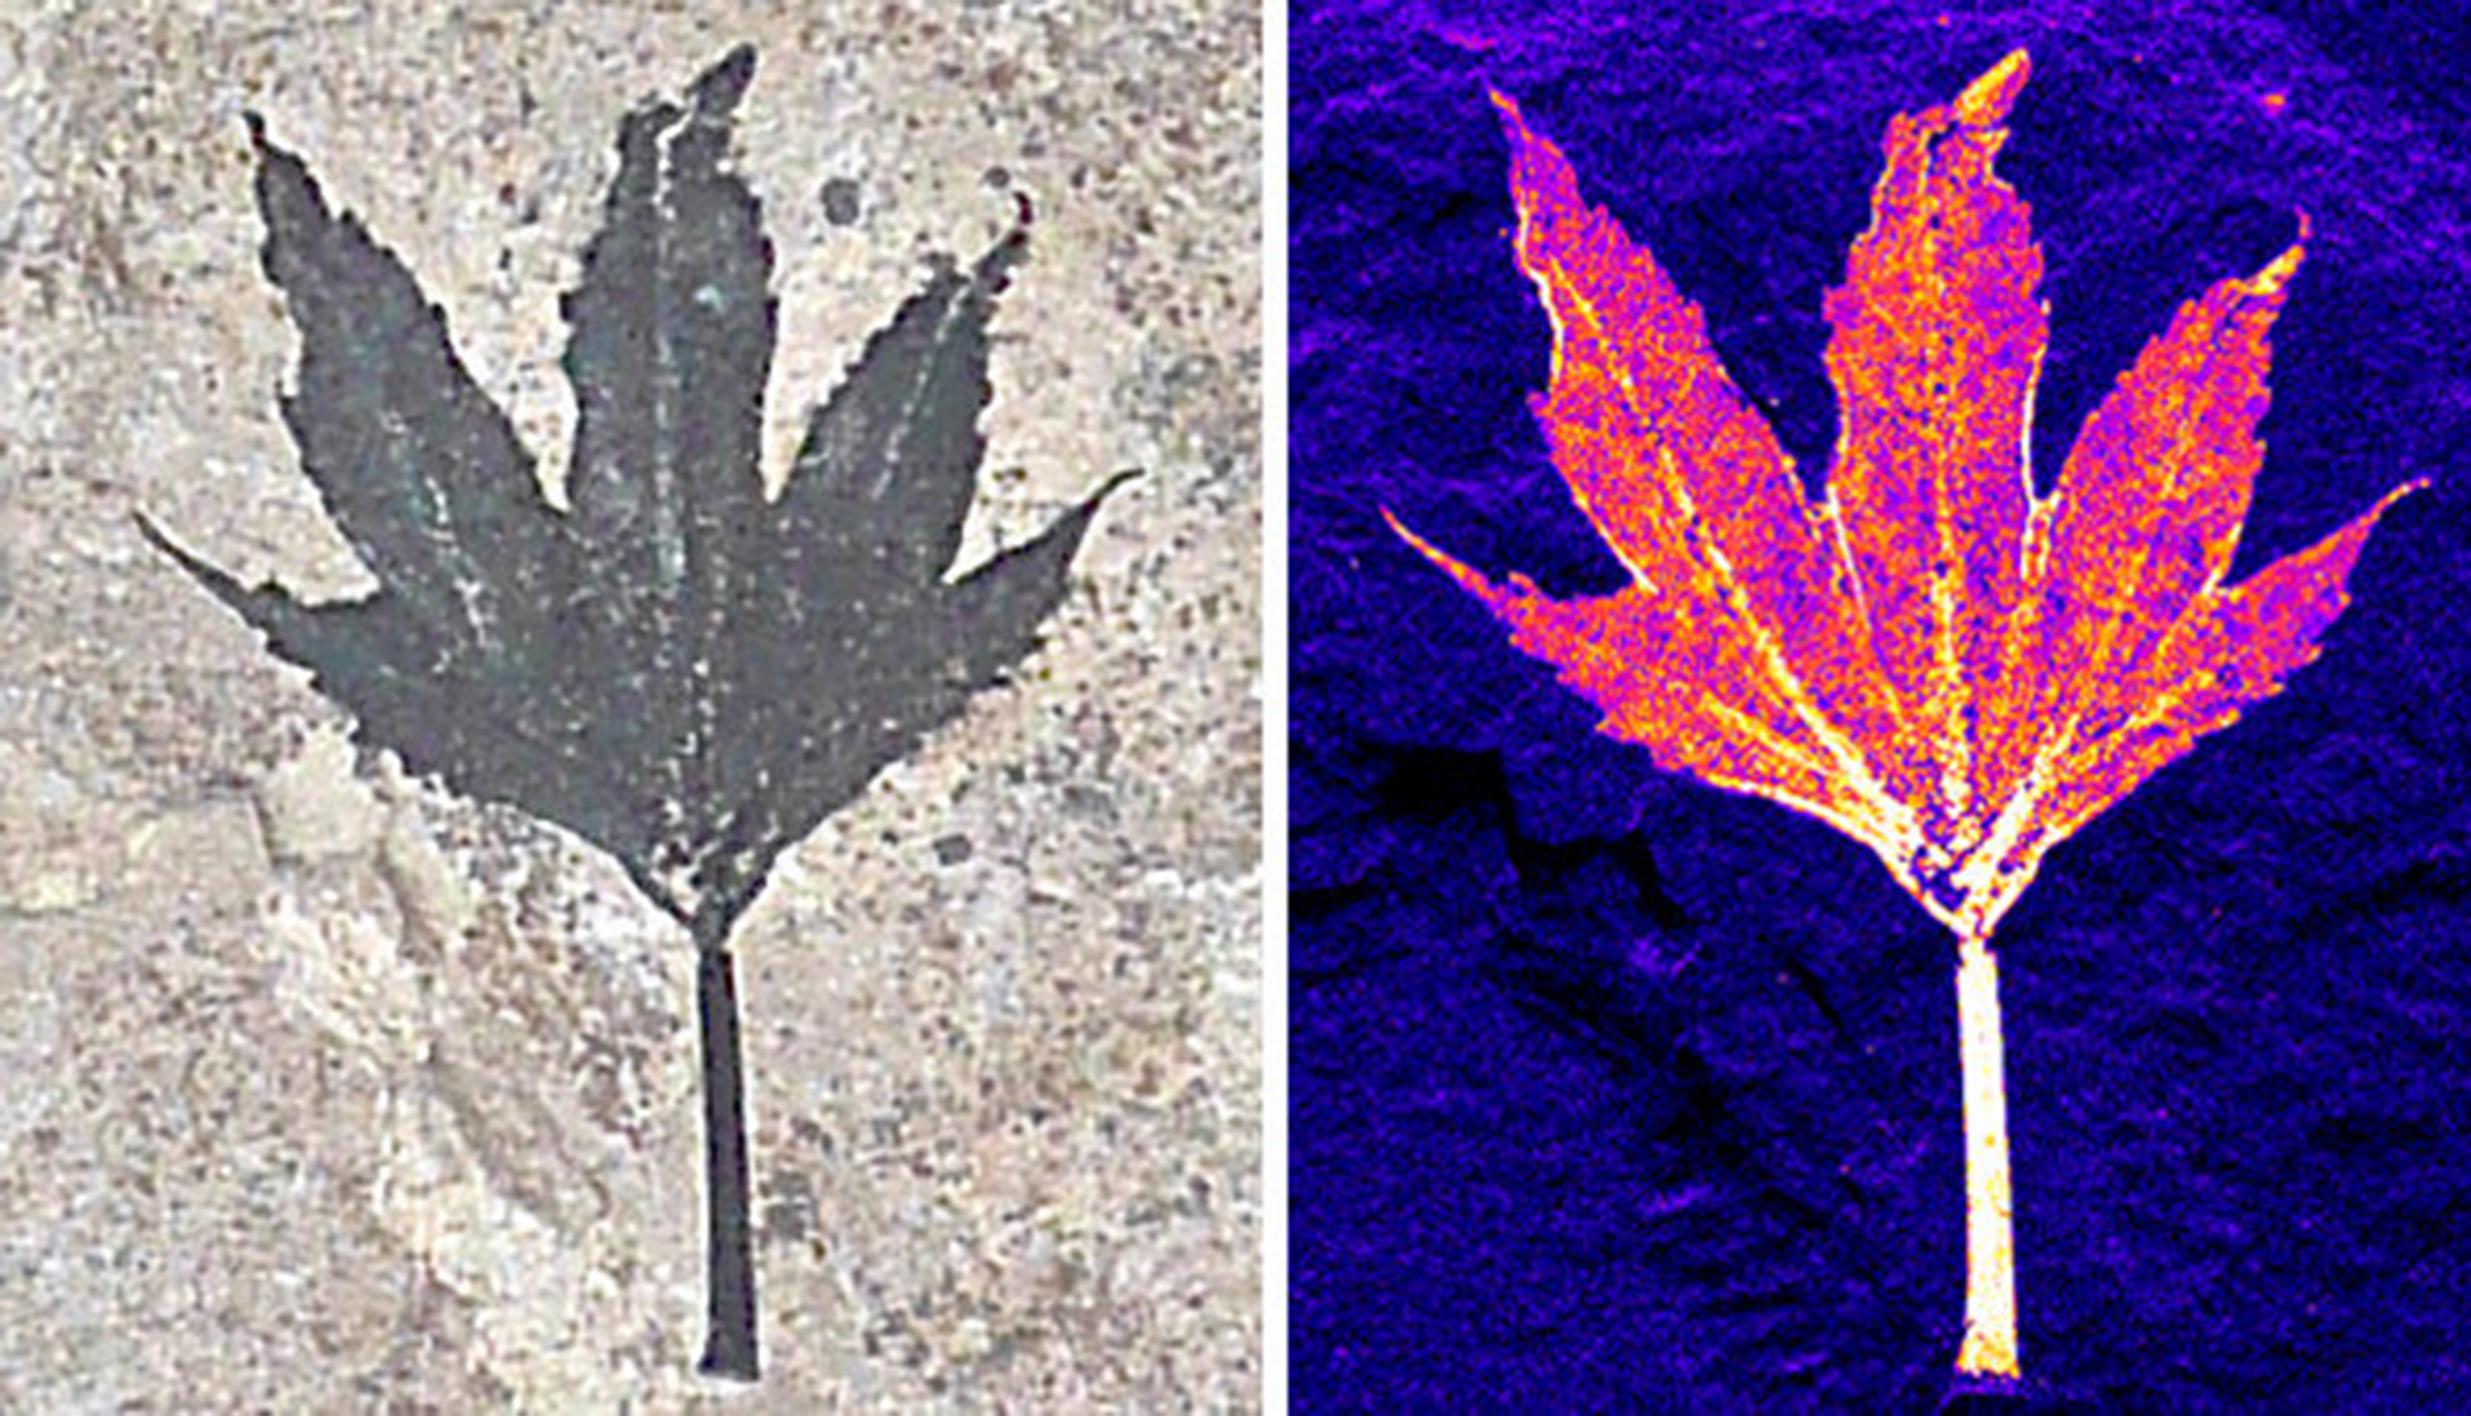 Fossil Leaves Preserve Living Chemistry | SLAC National Accelerator  Laboratory